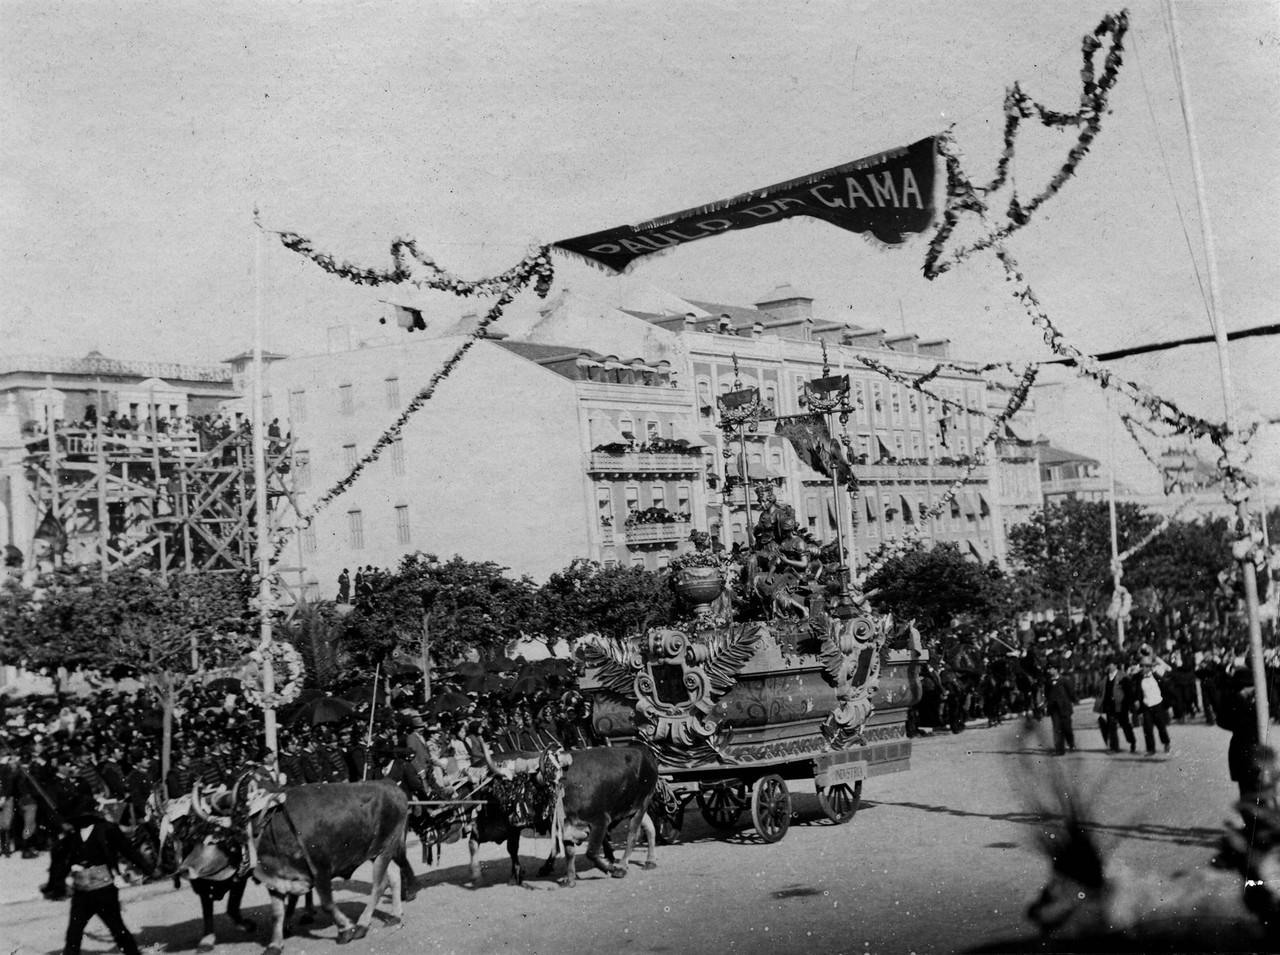 O cortejo na Avenida, 1898, foto do espólio de Ed